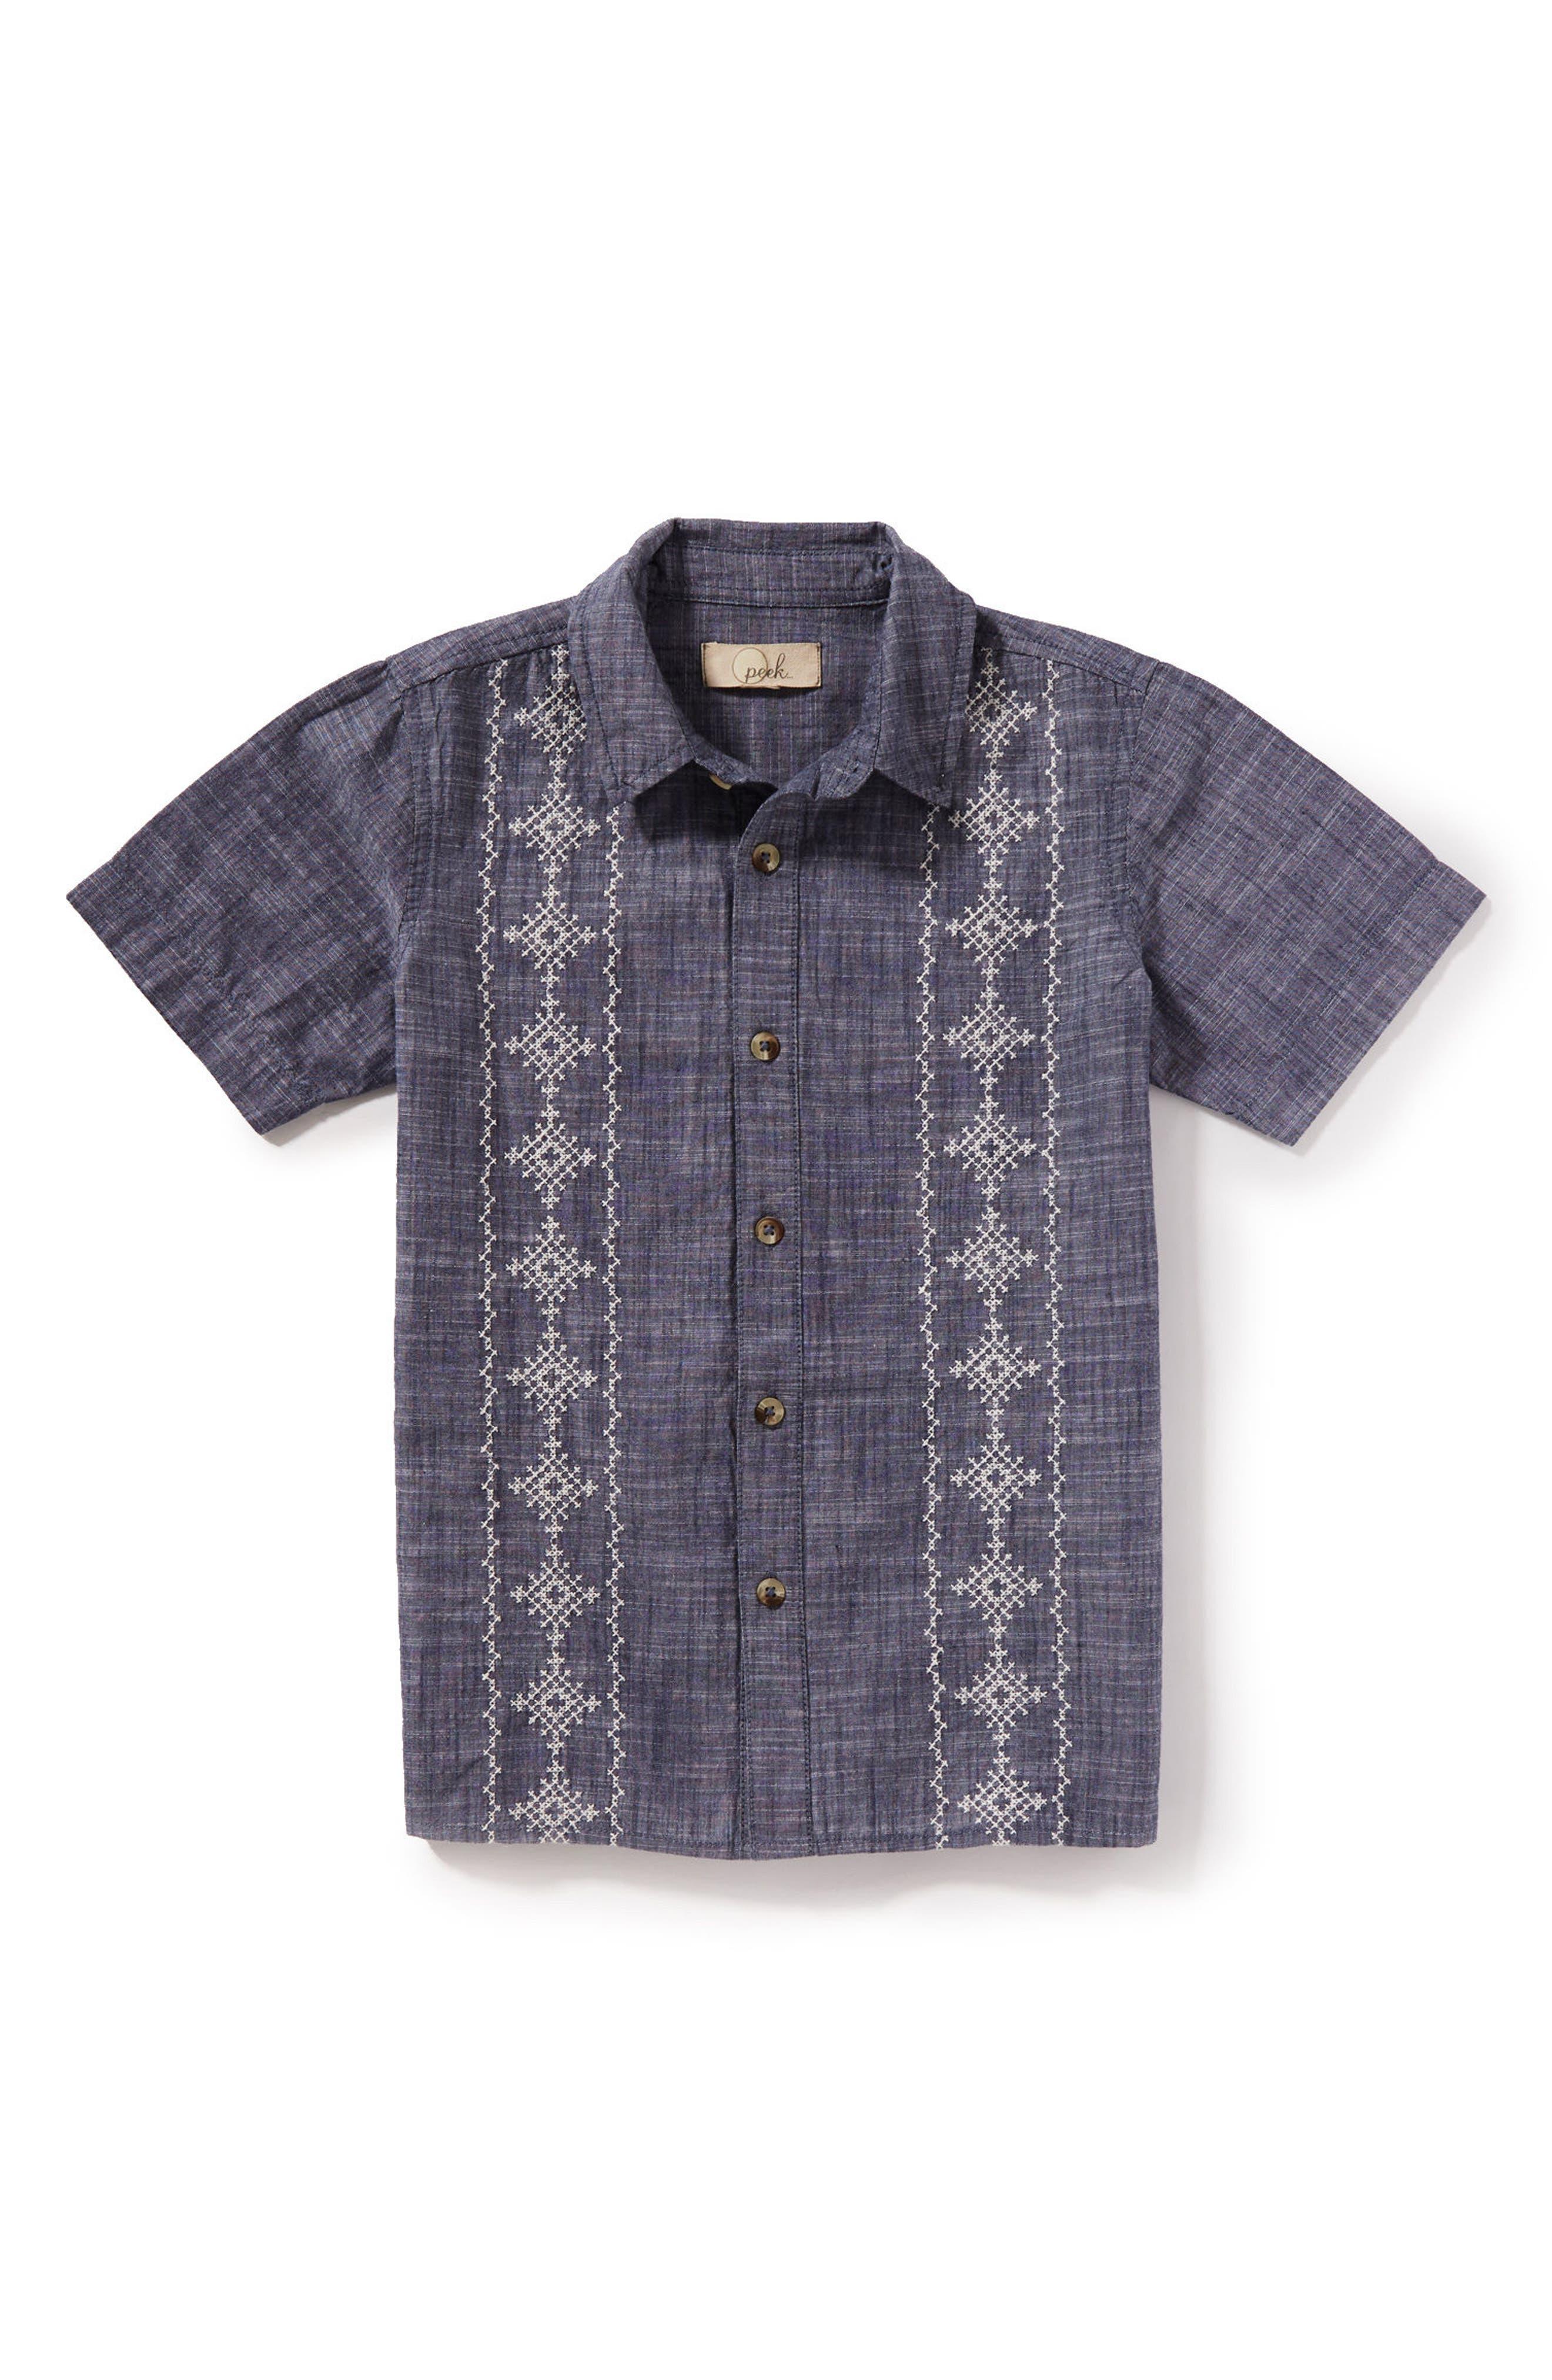 Peek Cuba Woven Shirt (Toddler Boys, Little Boys & Big Boys)